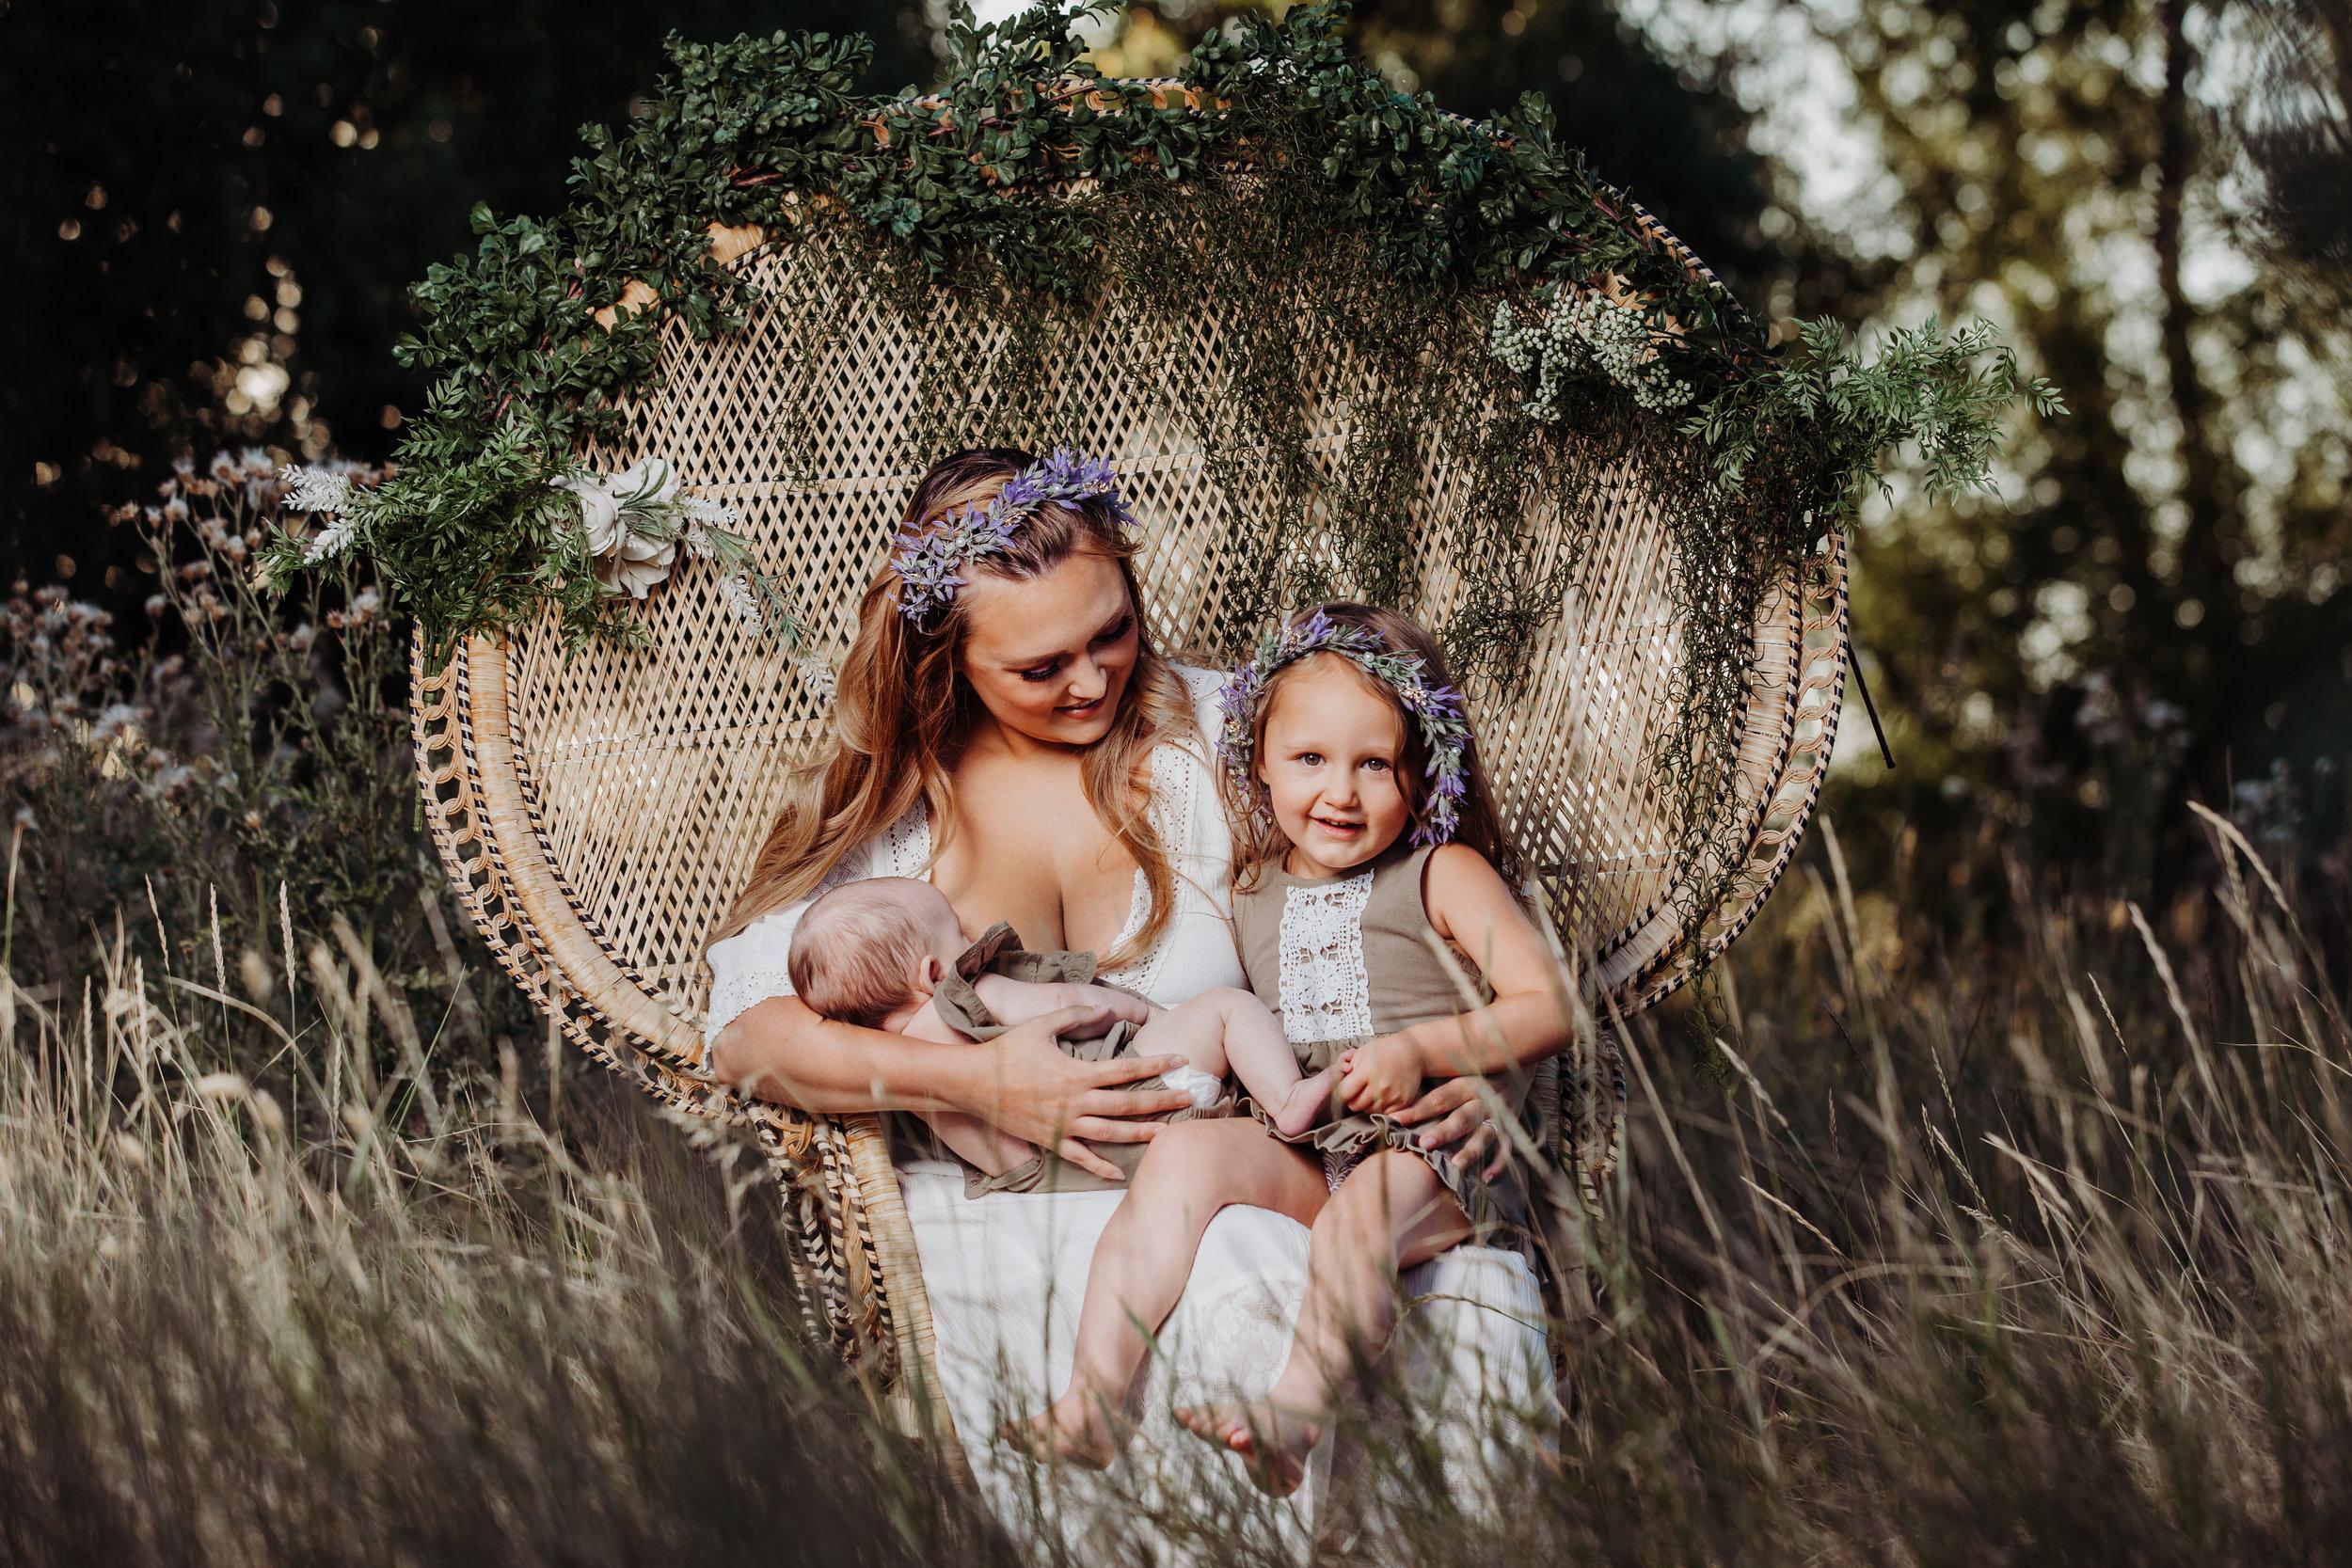 AM Photography LLC Breastfeeding Portrait Session 01